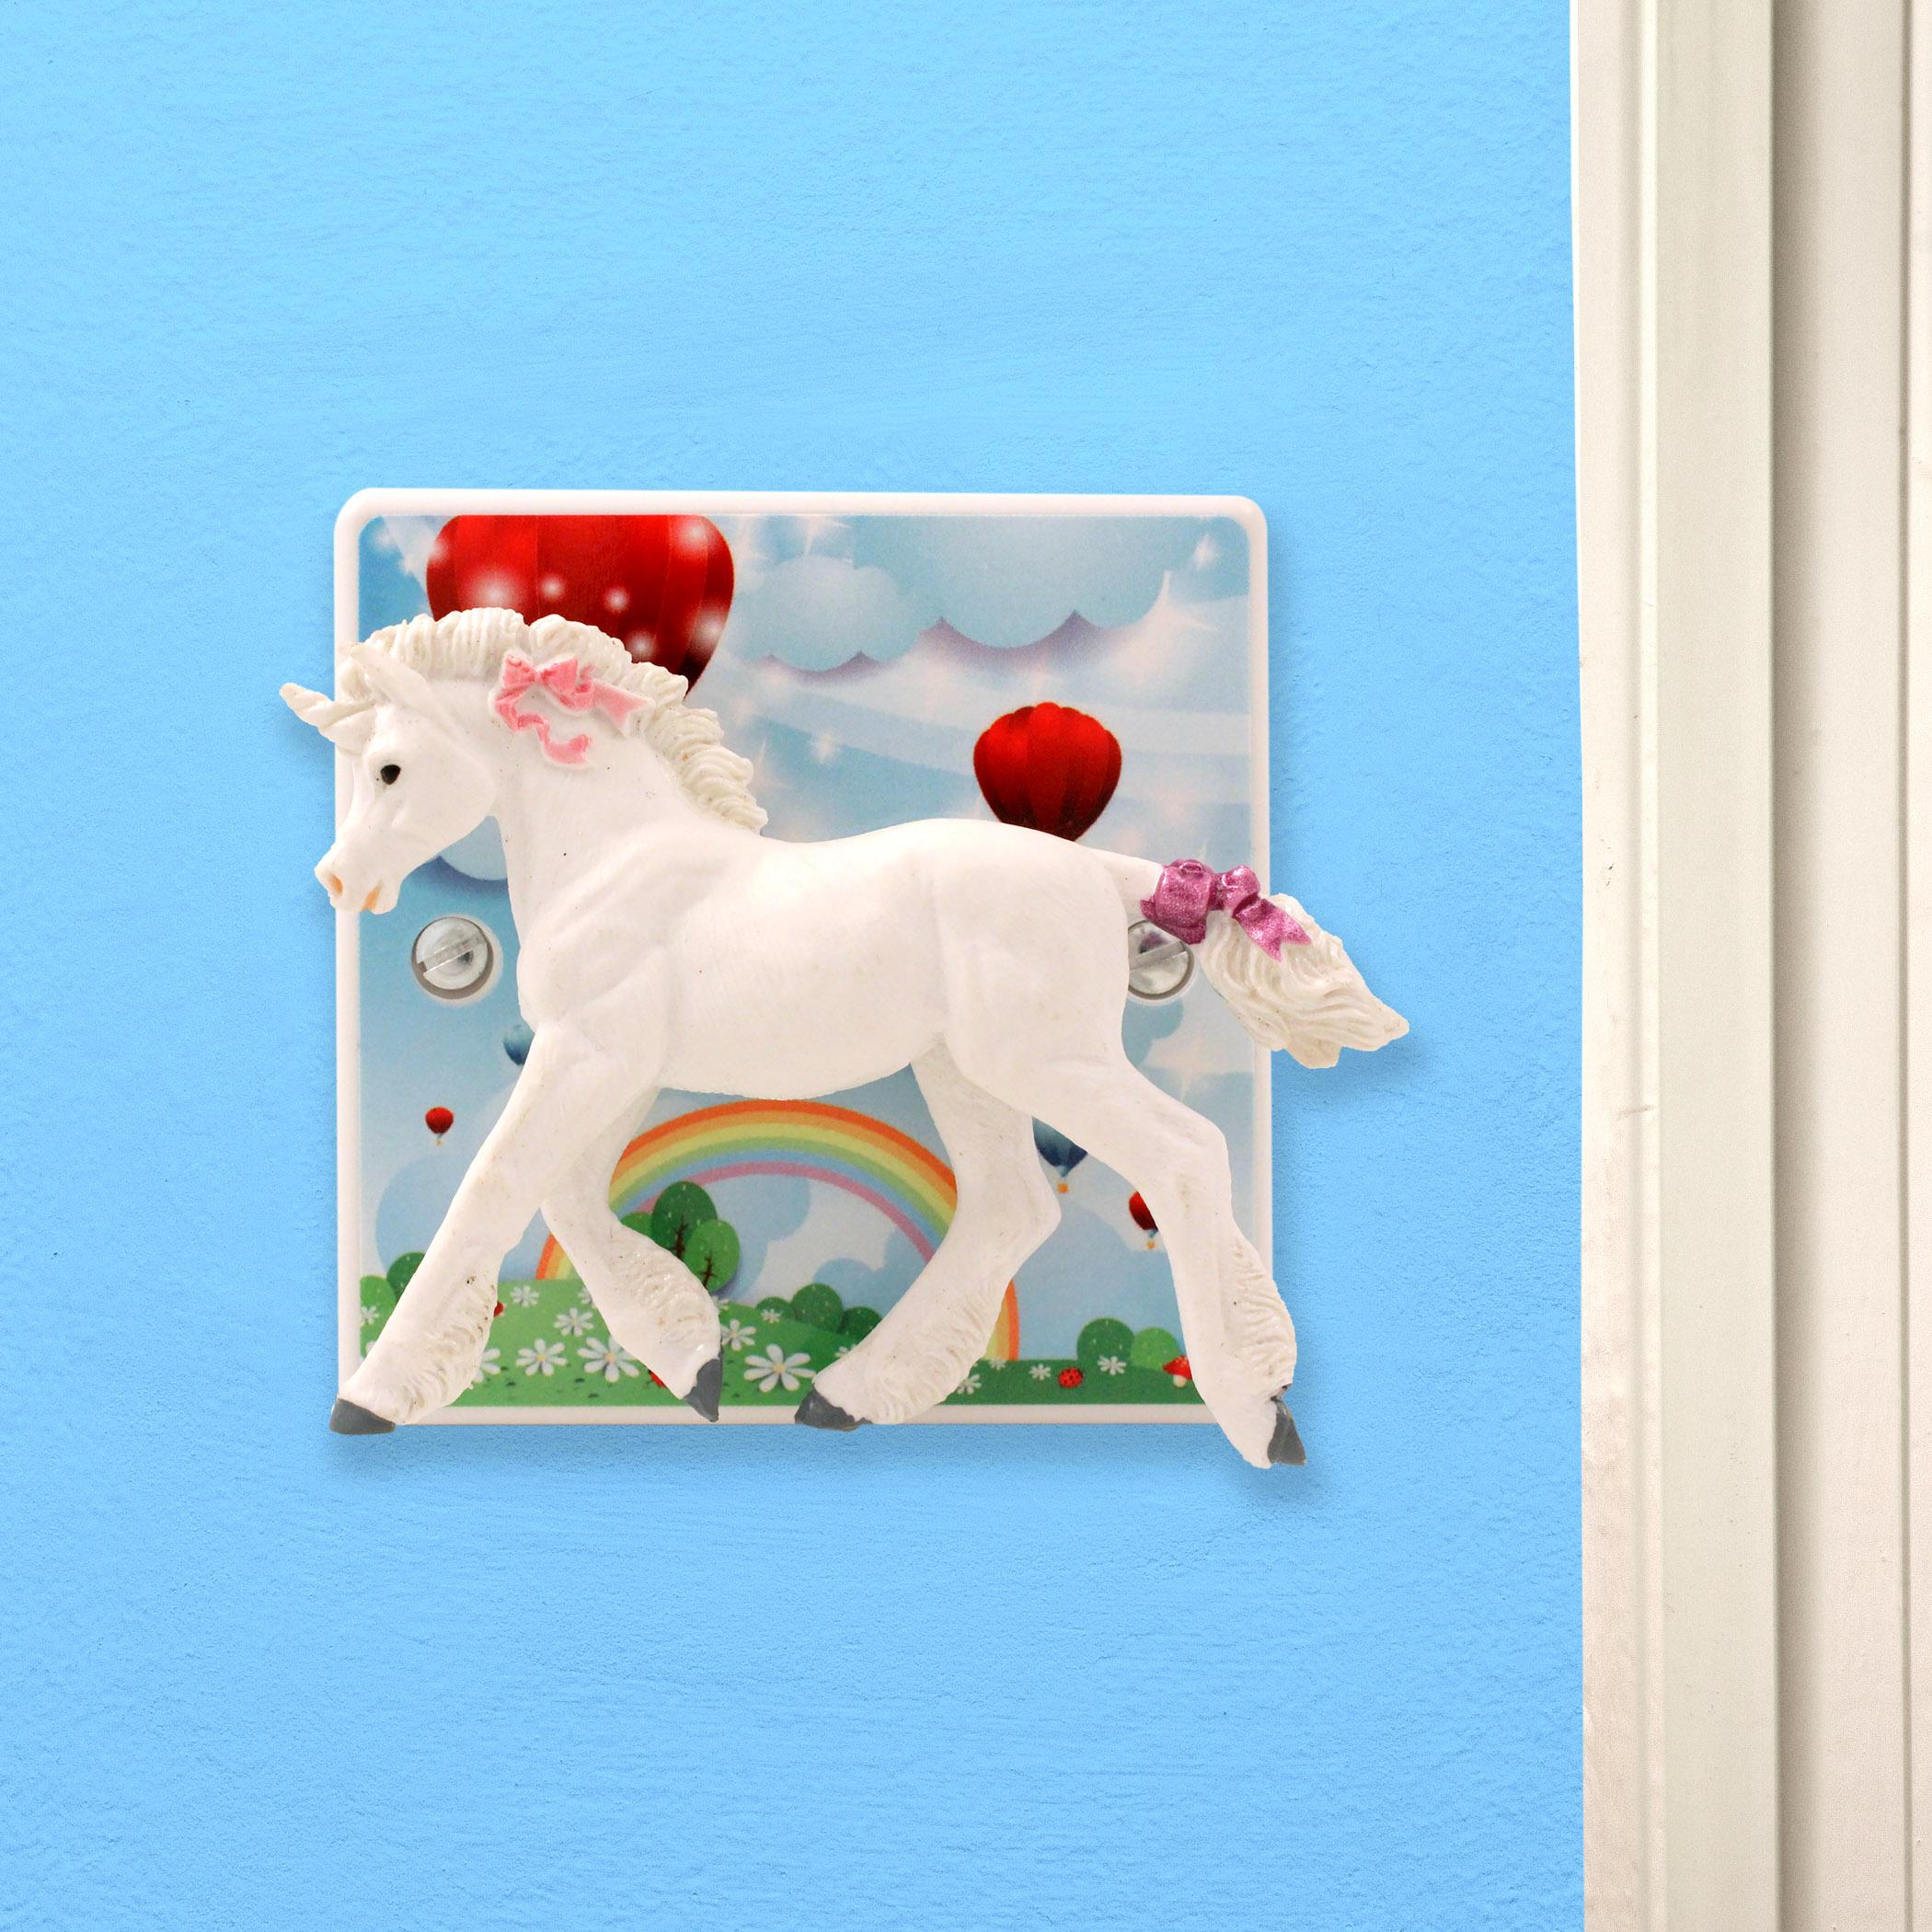 Unicorn bedroom decor ideas the candy queen designs blog for Unicorn bedroom decor